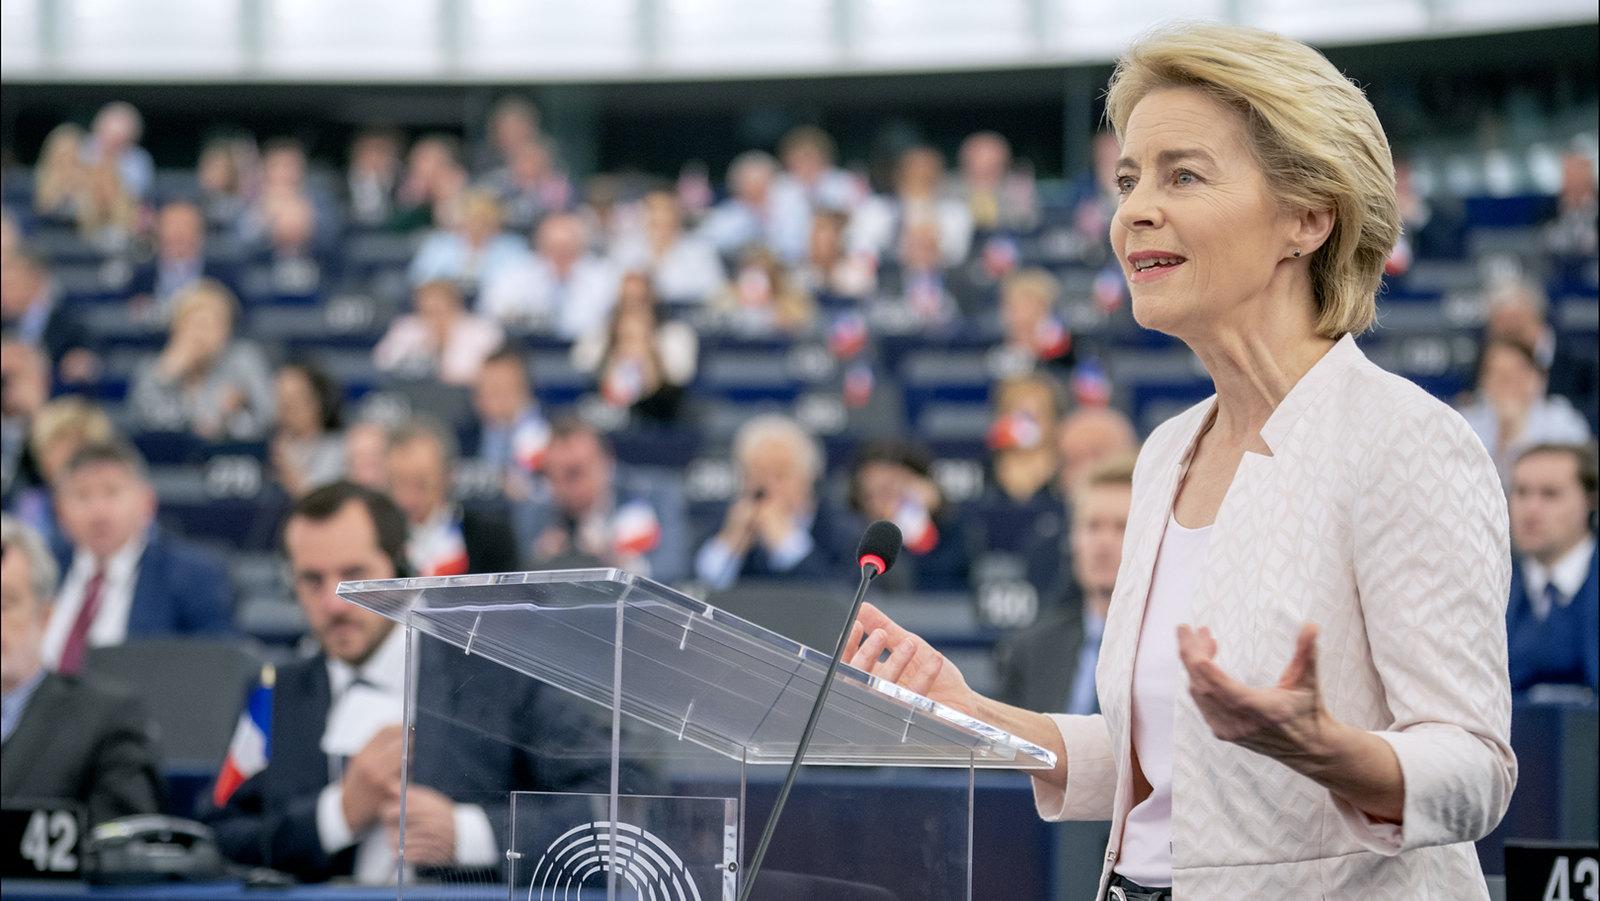 https://www.flickr.com/photos/european_parliament/48298975382